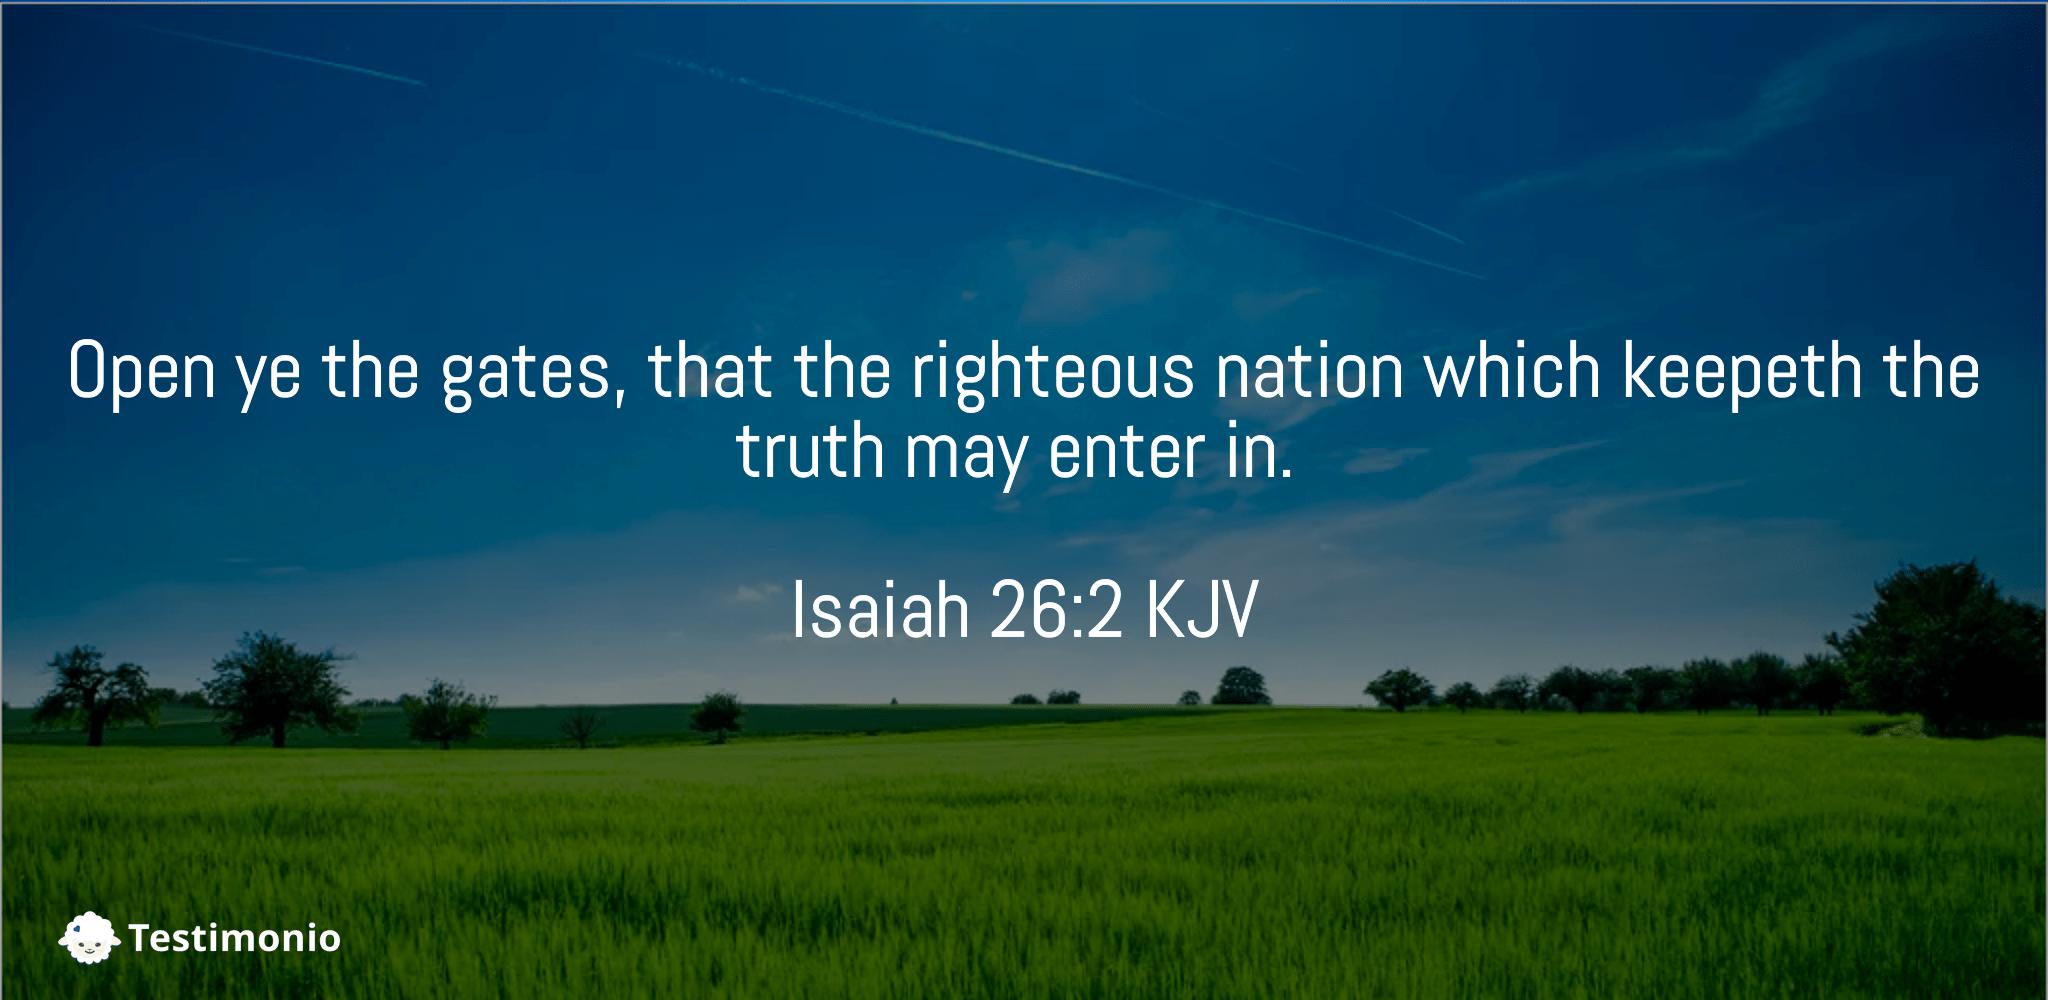 Isaiah 26:2